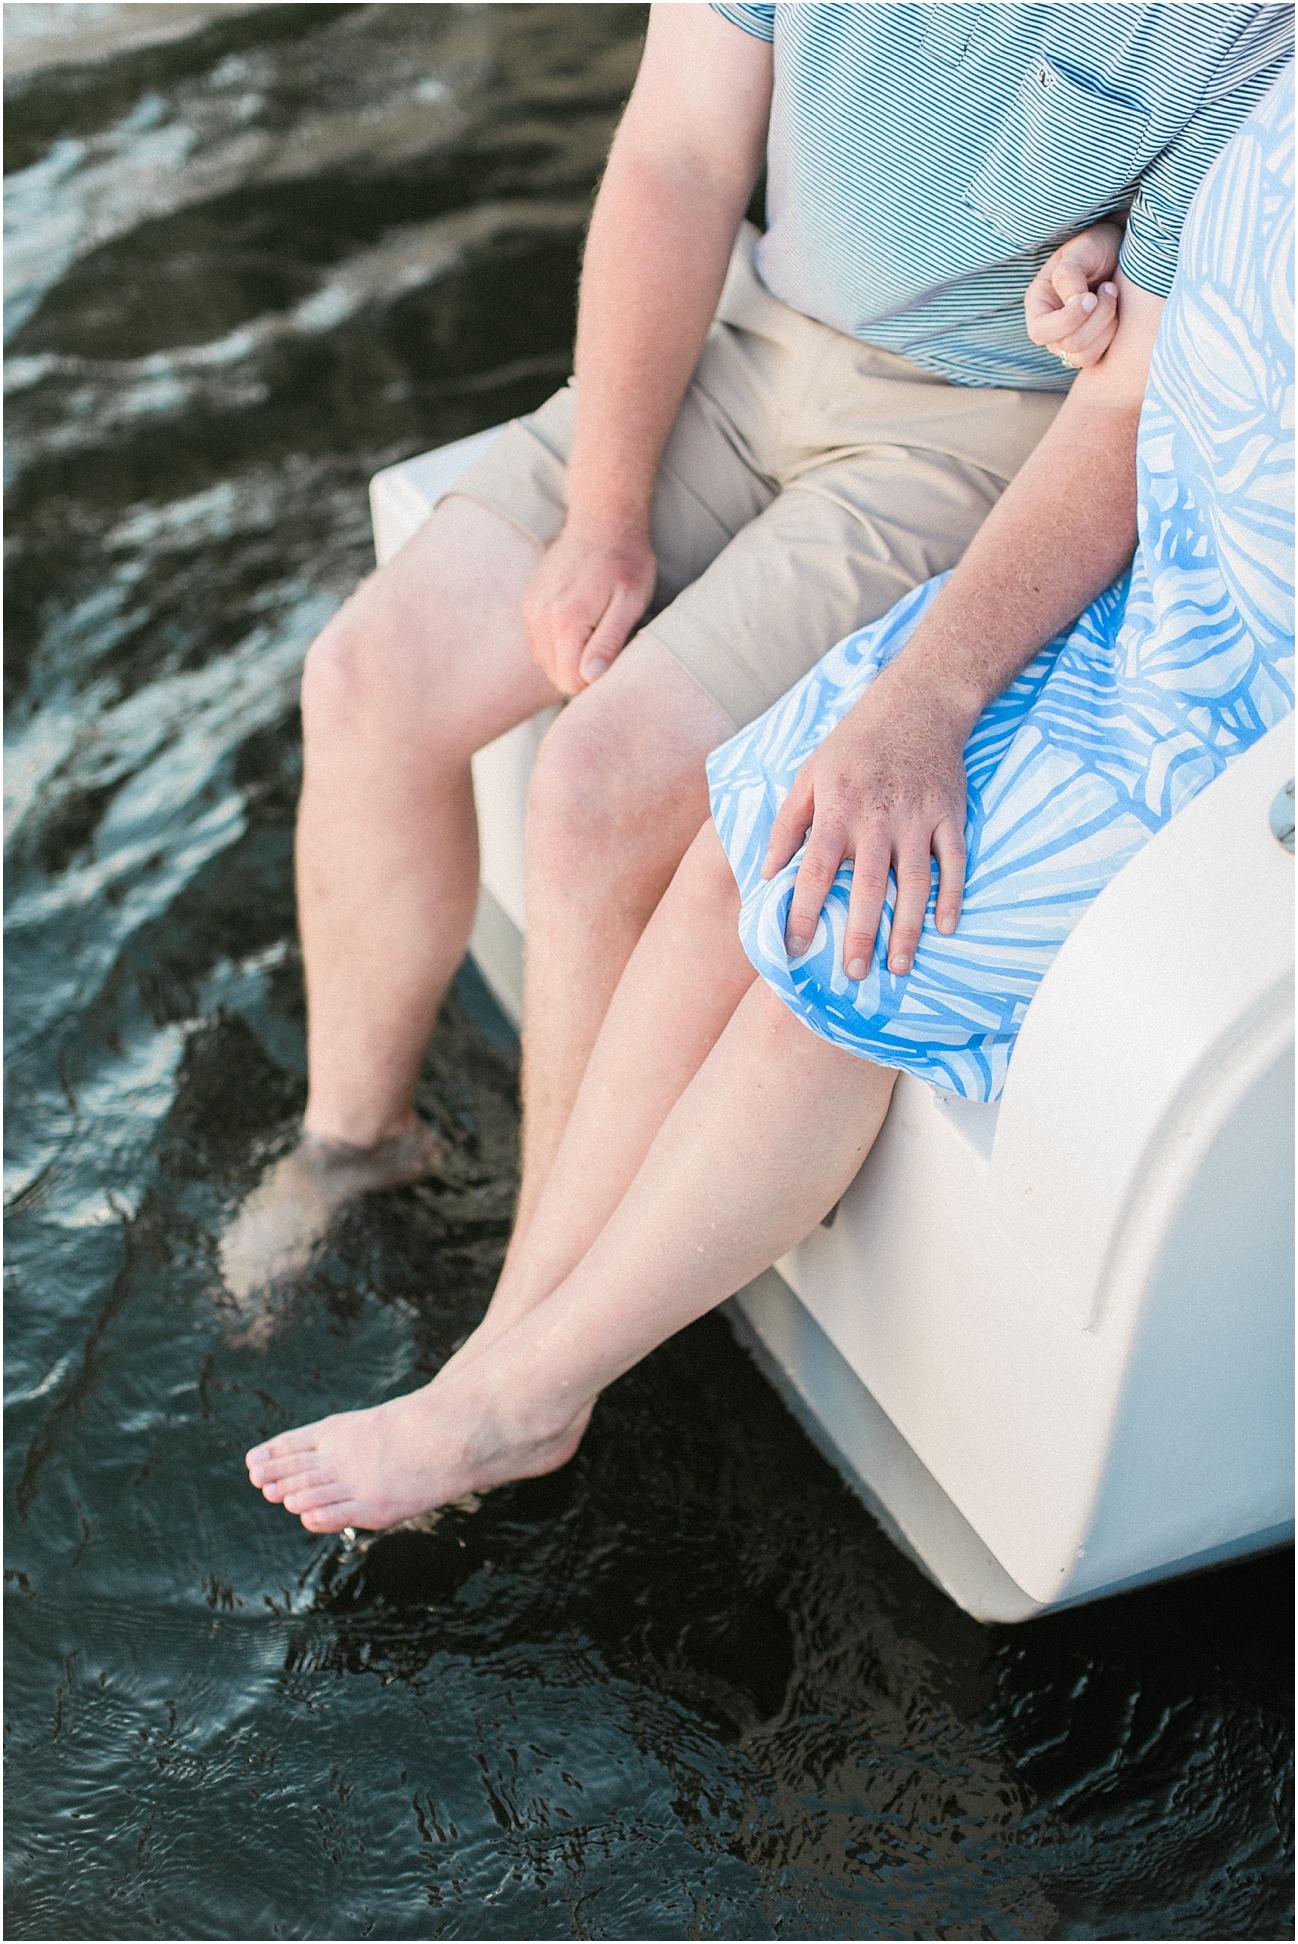 shannon_dan_engagement_session_sea_crest_beach_old_silver_chartroom_yacht_club_cape_cod_boston_wedding_photographer_meredith_jane_photography_photo_0345.jpg